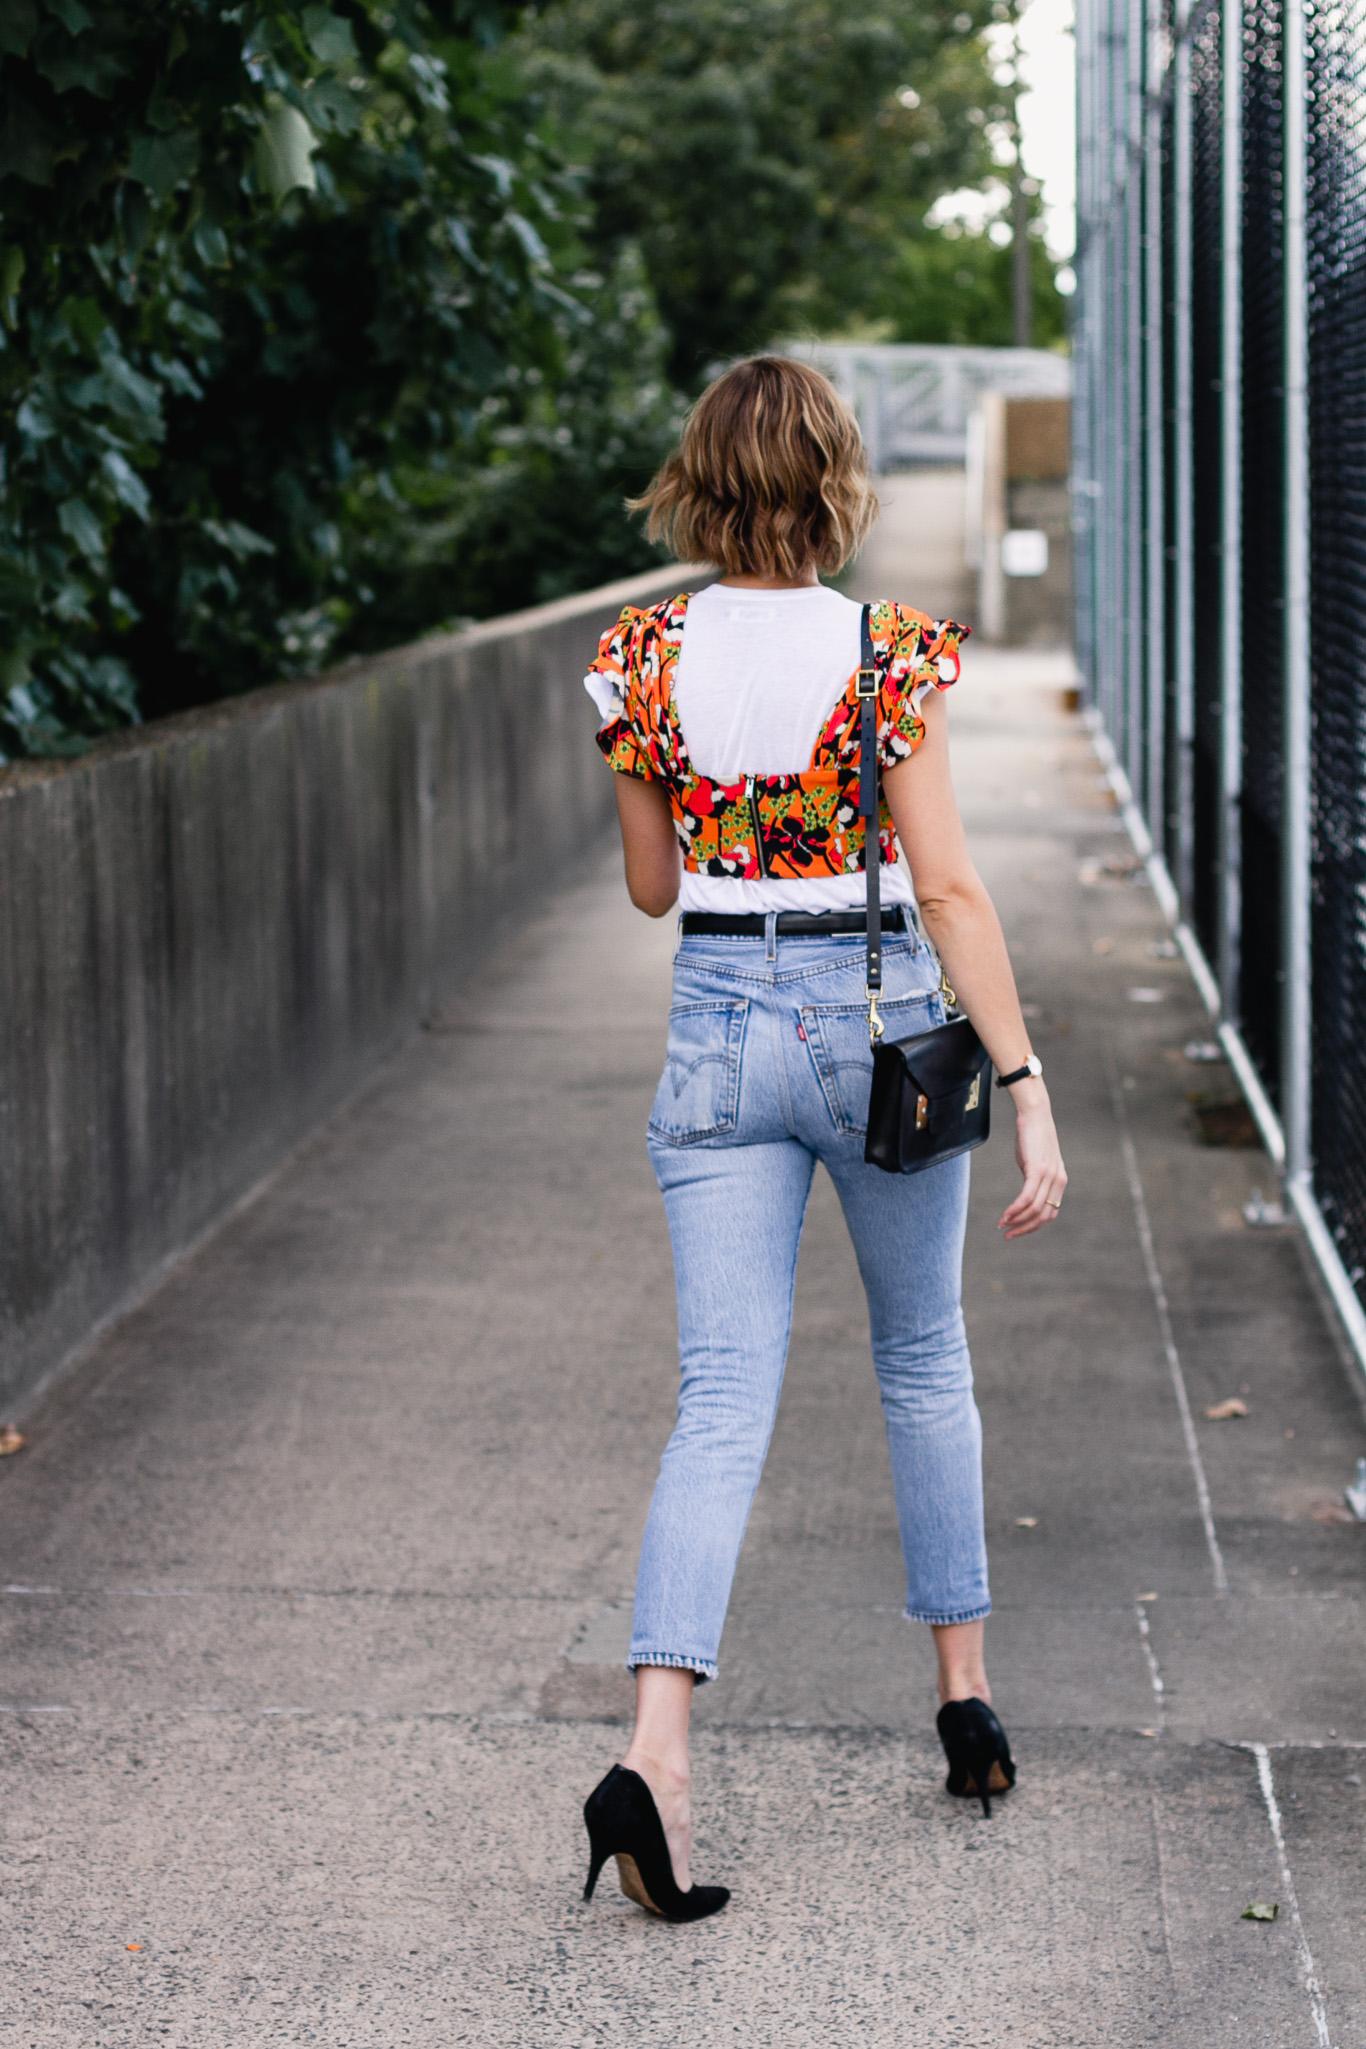 Mango crop top, Ferragamo belt, and Re/Done jeans